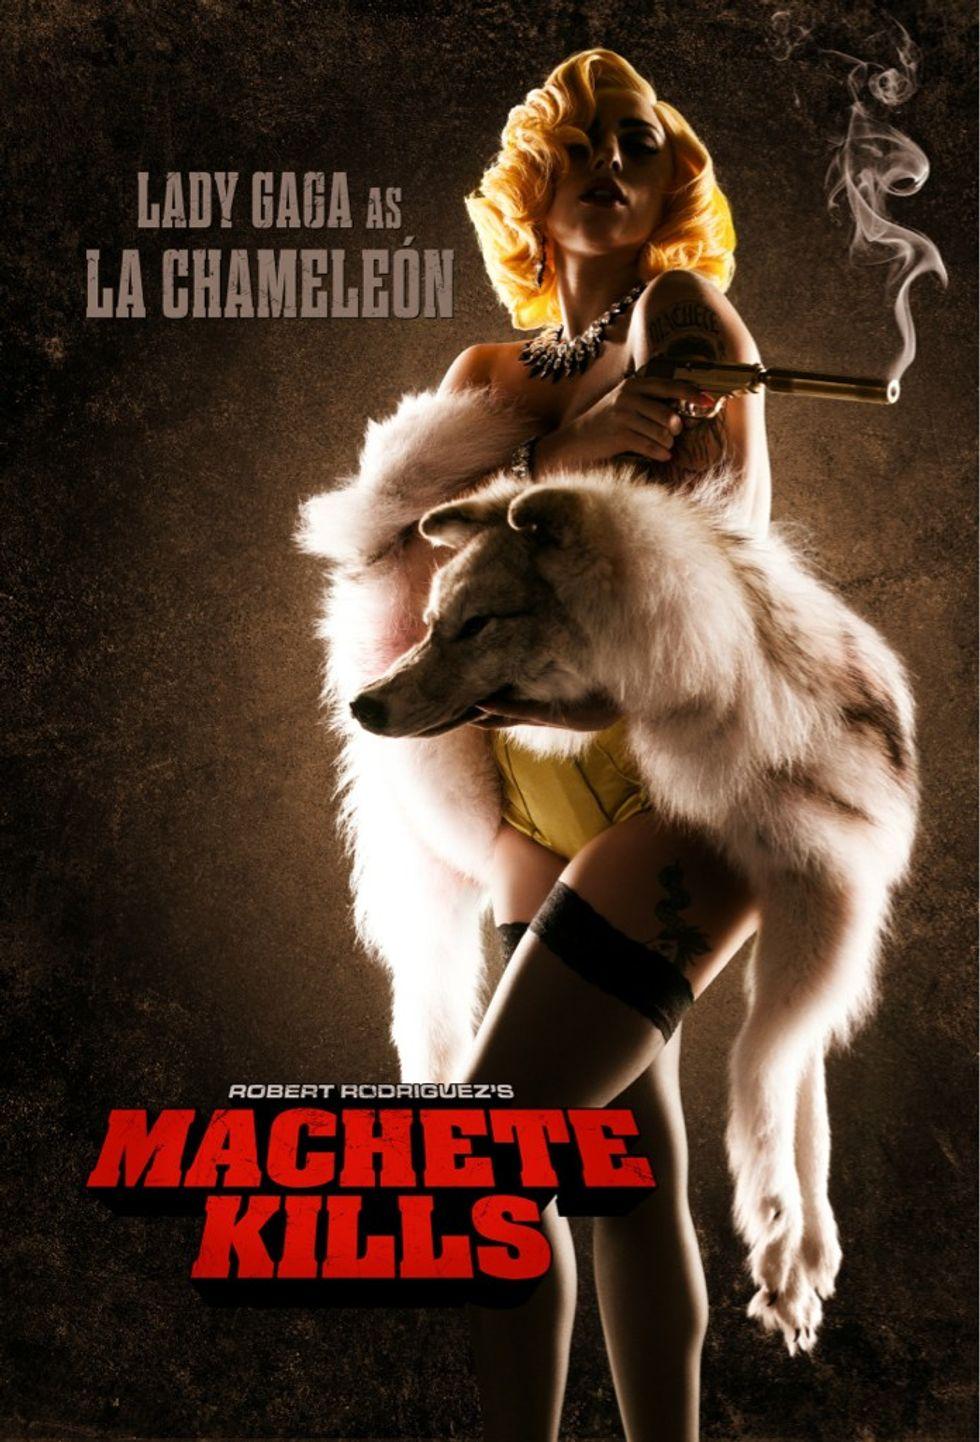 Lady Gaga attrice in Machete kills